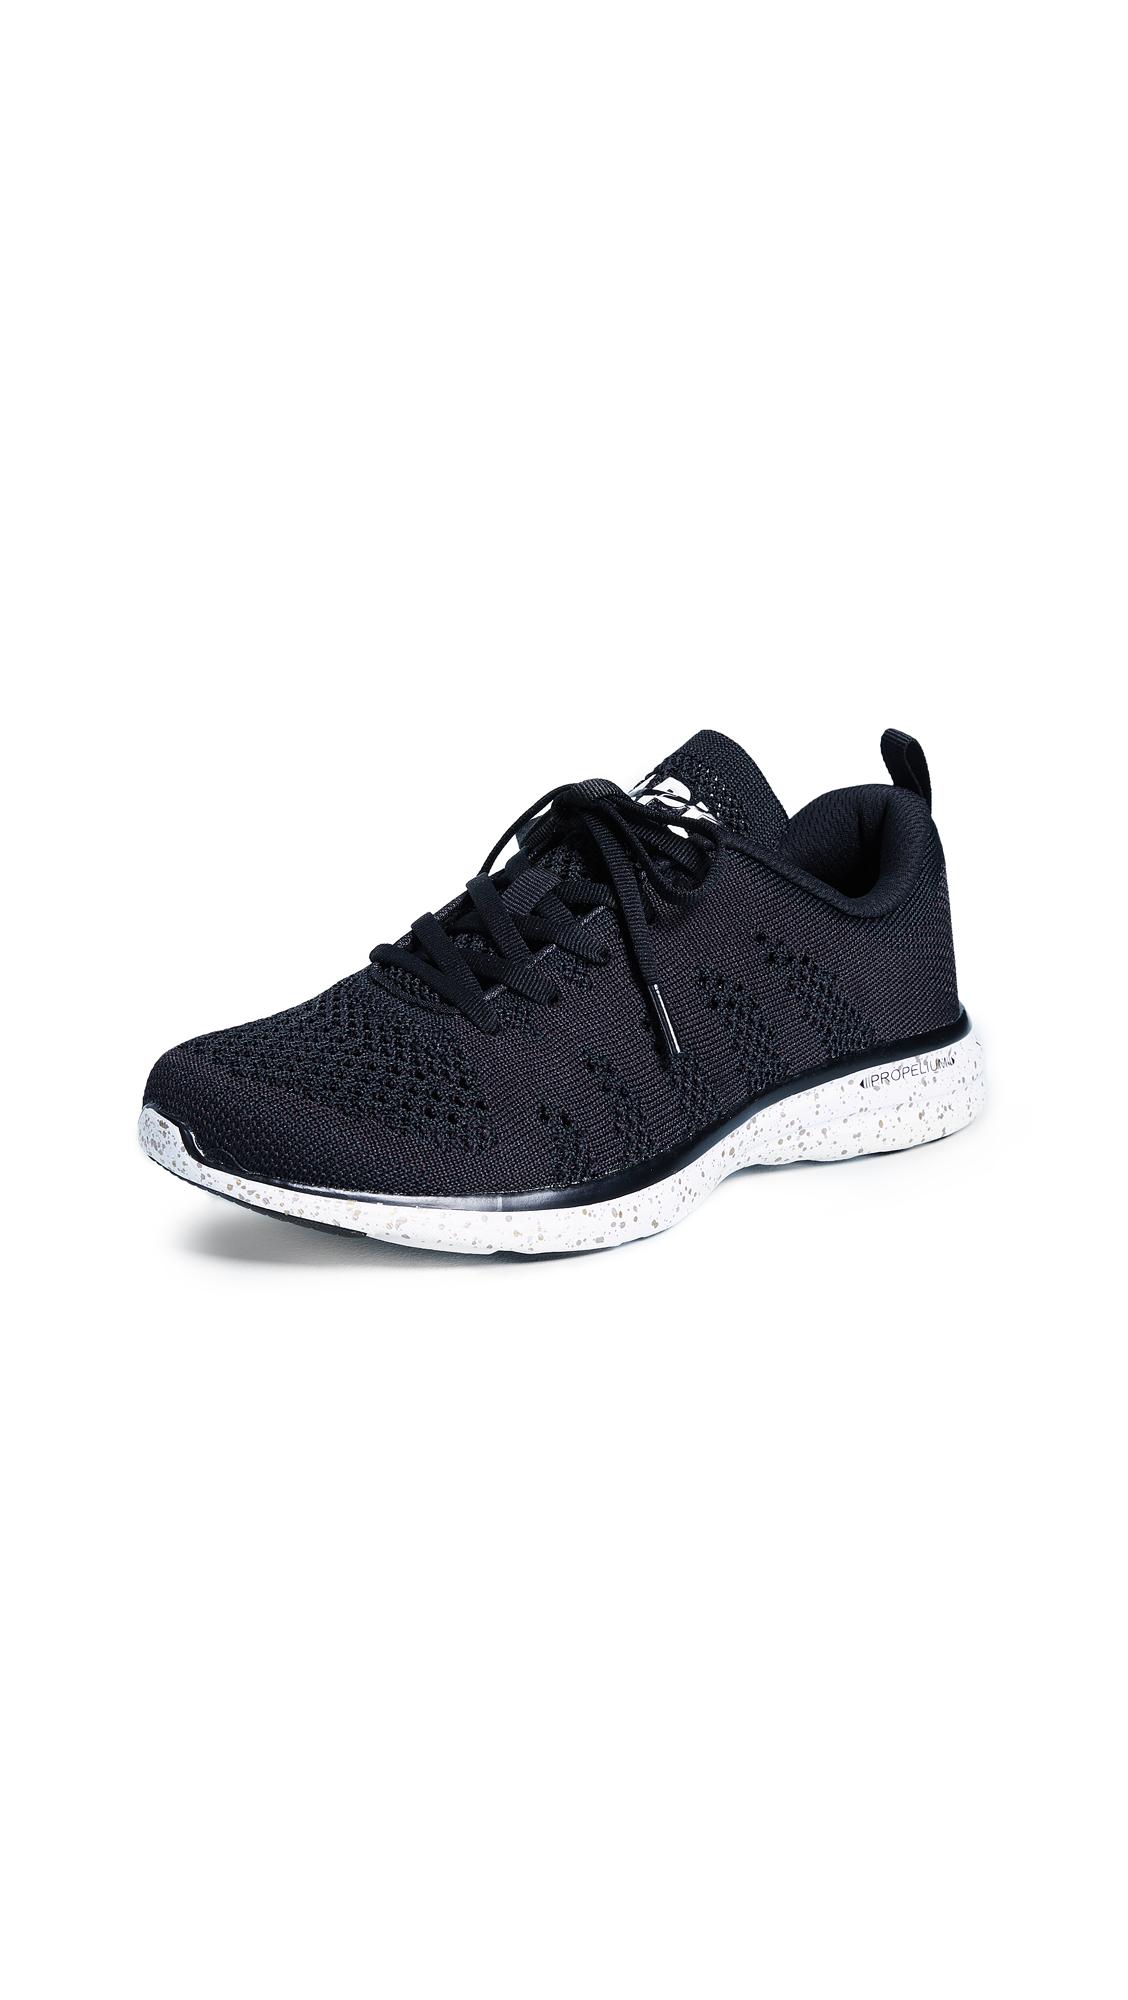 APL: Athletic Propulsion Labs Techloom Pro Sneakers - Black/Metallic Speckle